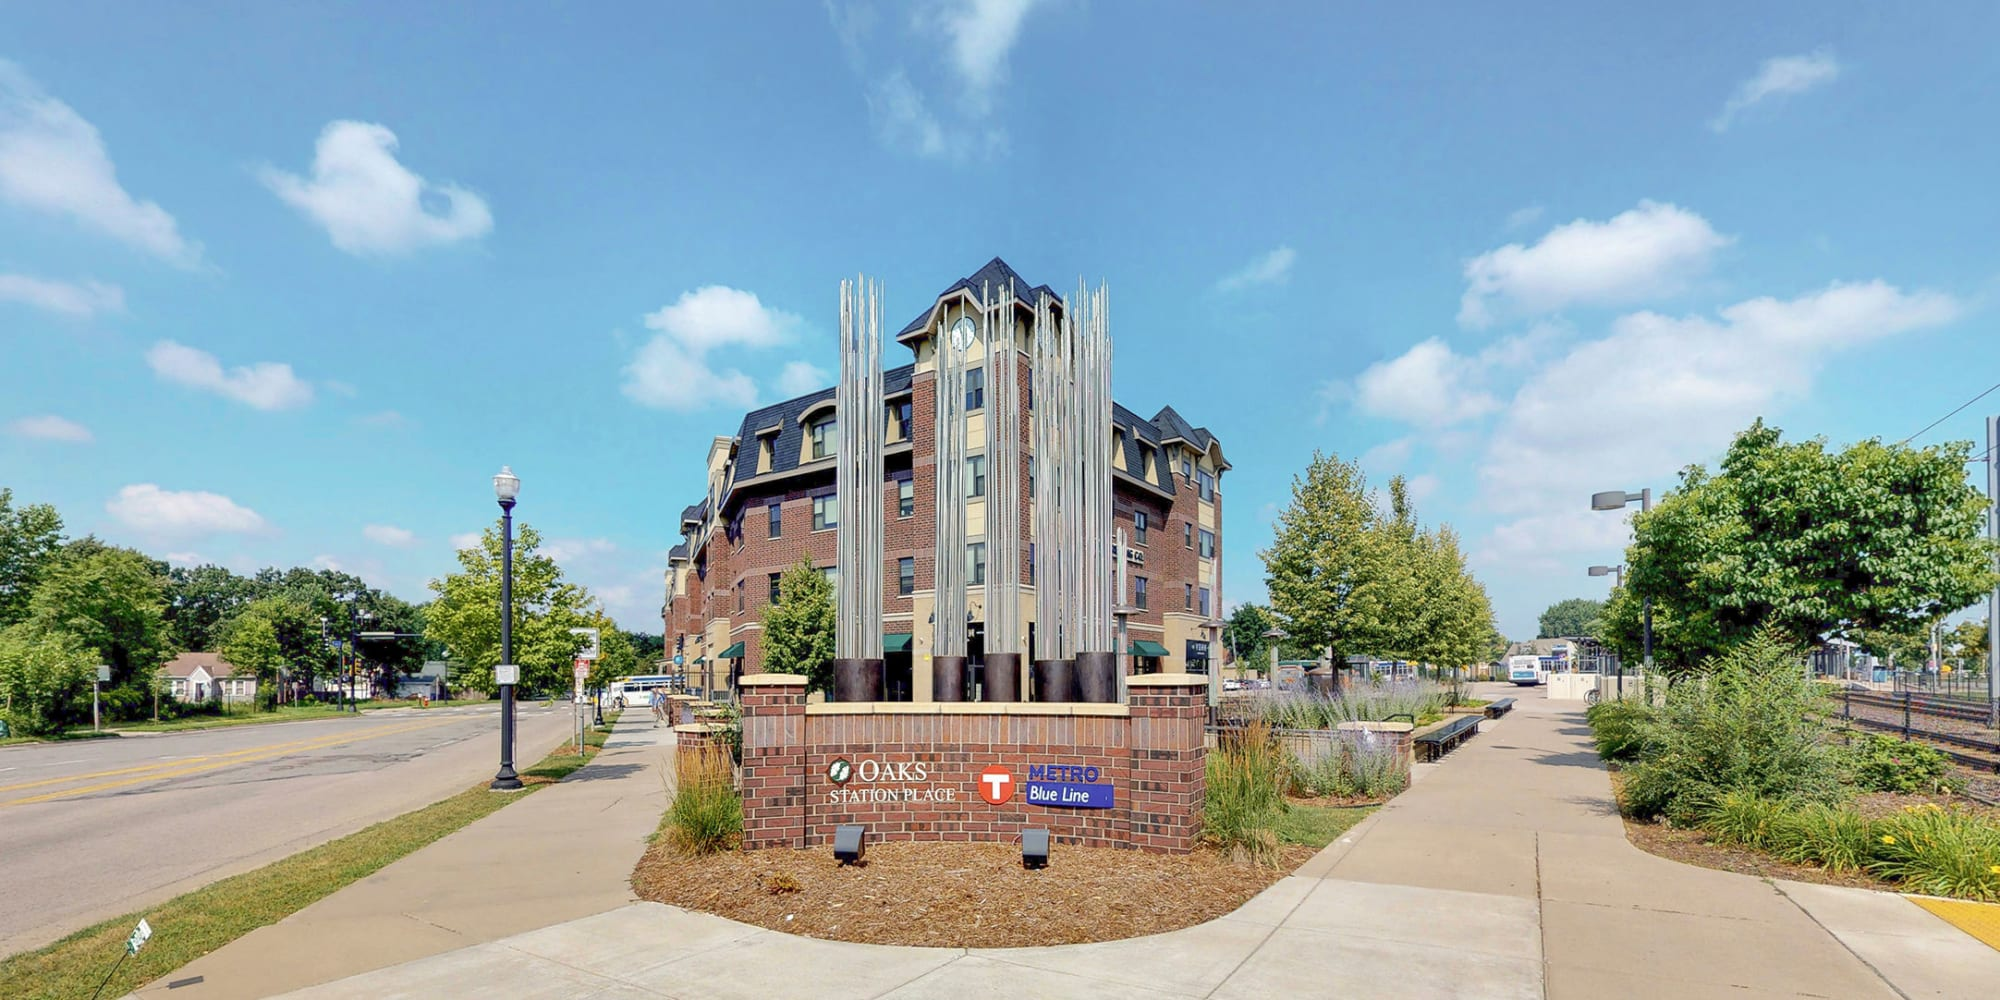 Oaks Station Place apartments in Minneapolis, Minnesota